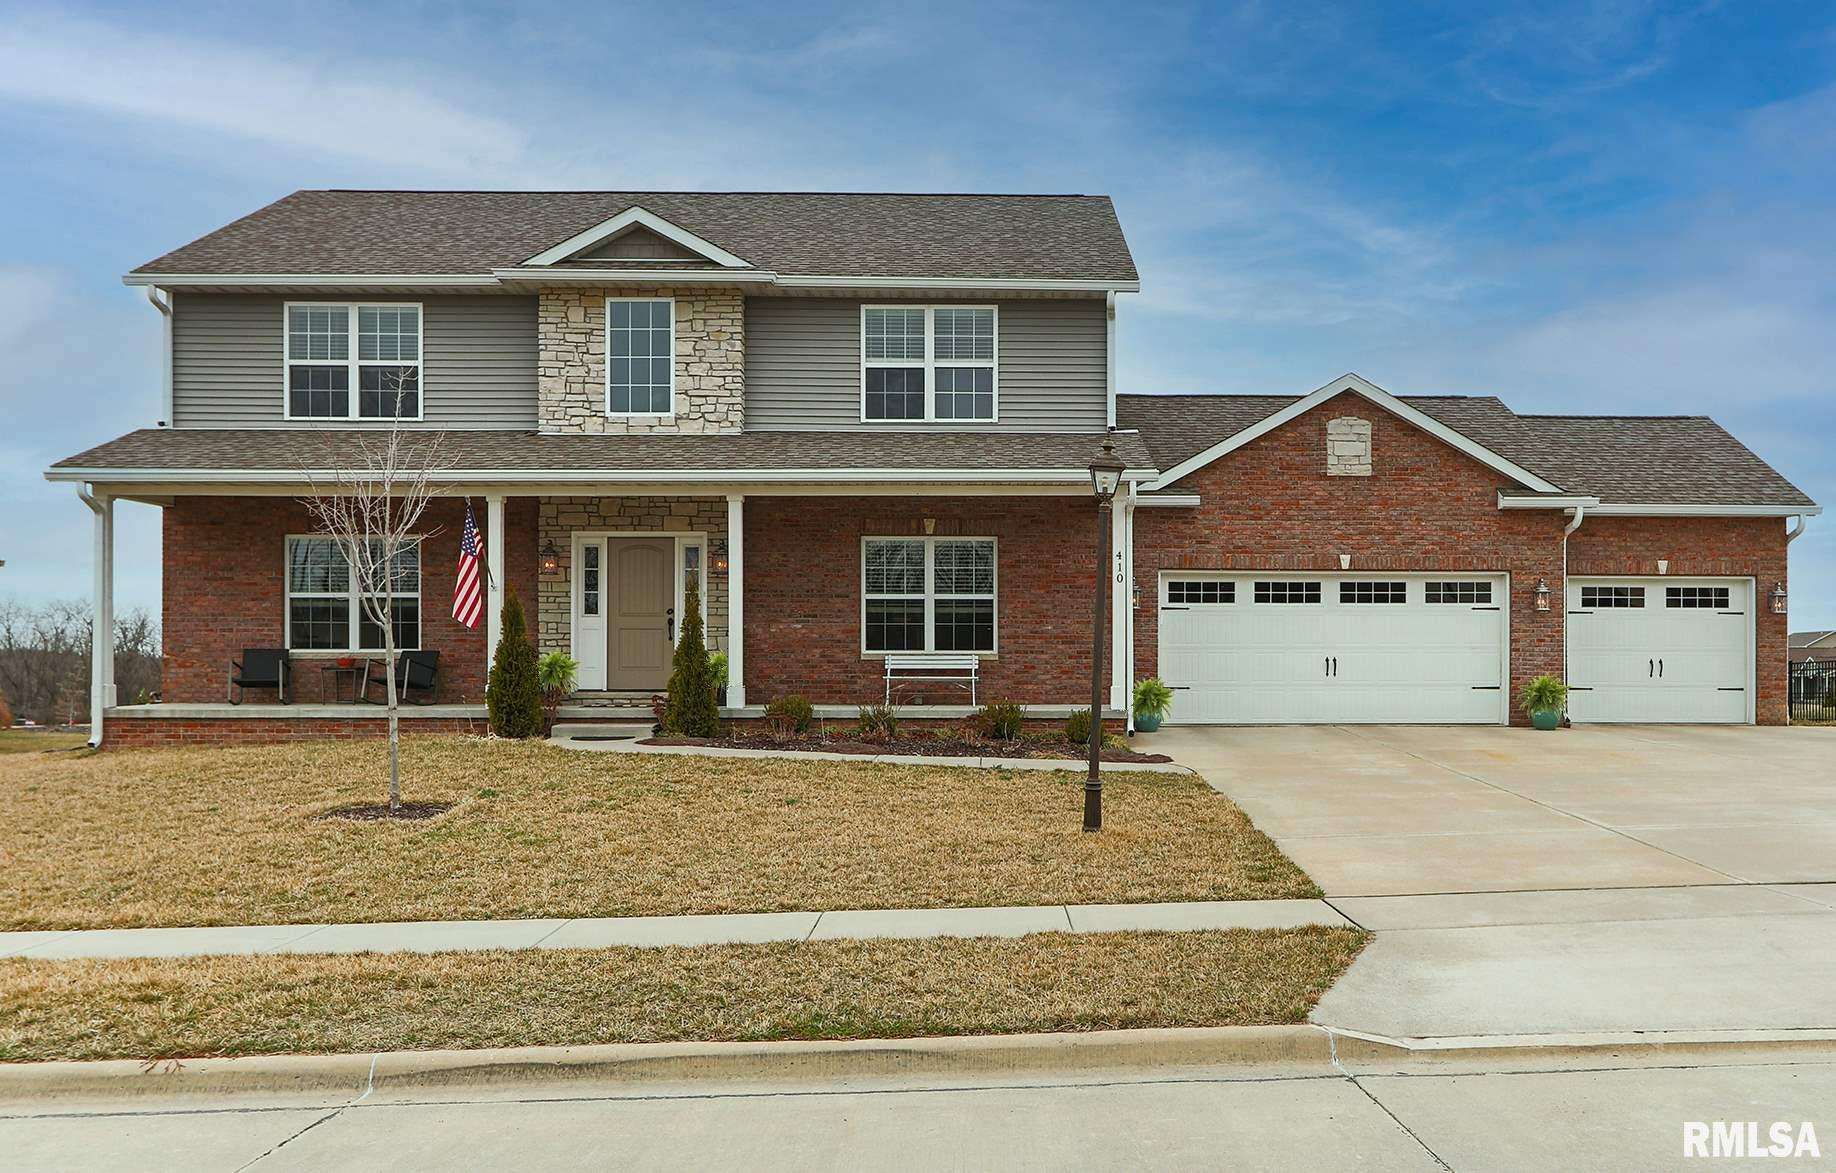 410 WHISTLING STRAIT Property Photo - Washington, IL real estate listing